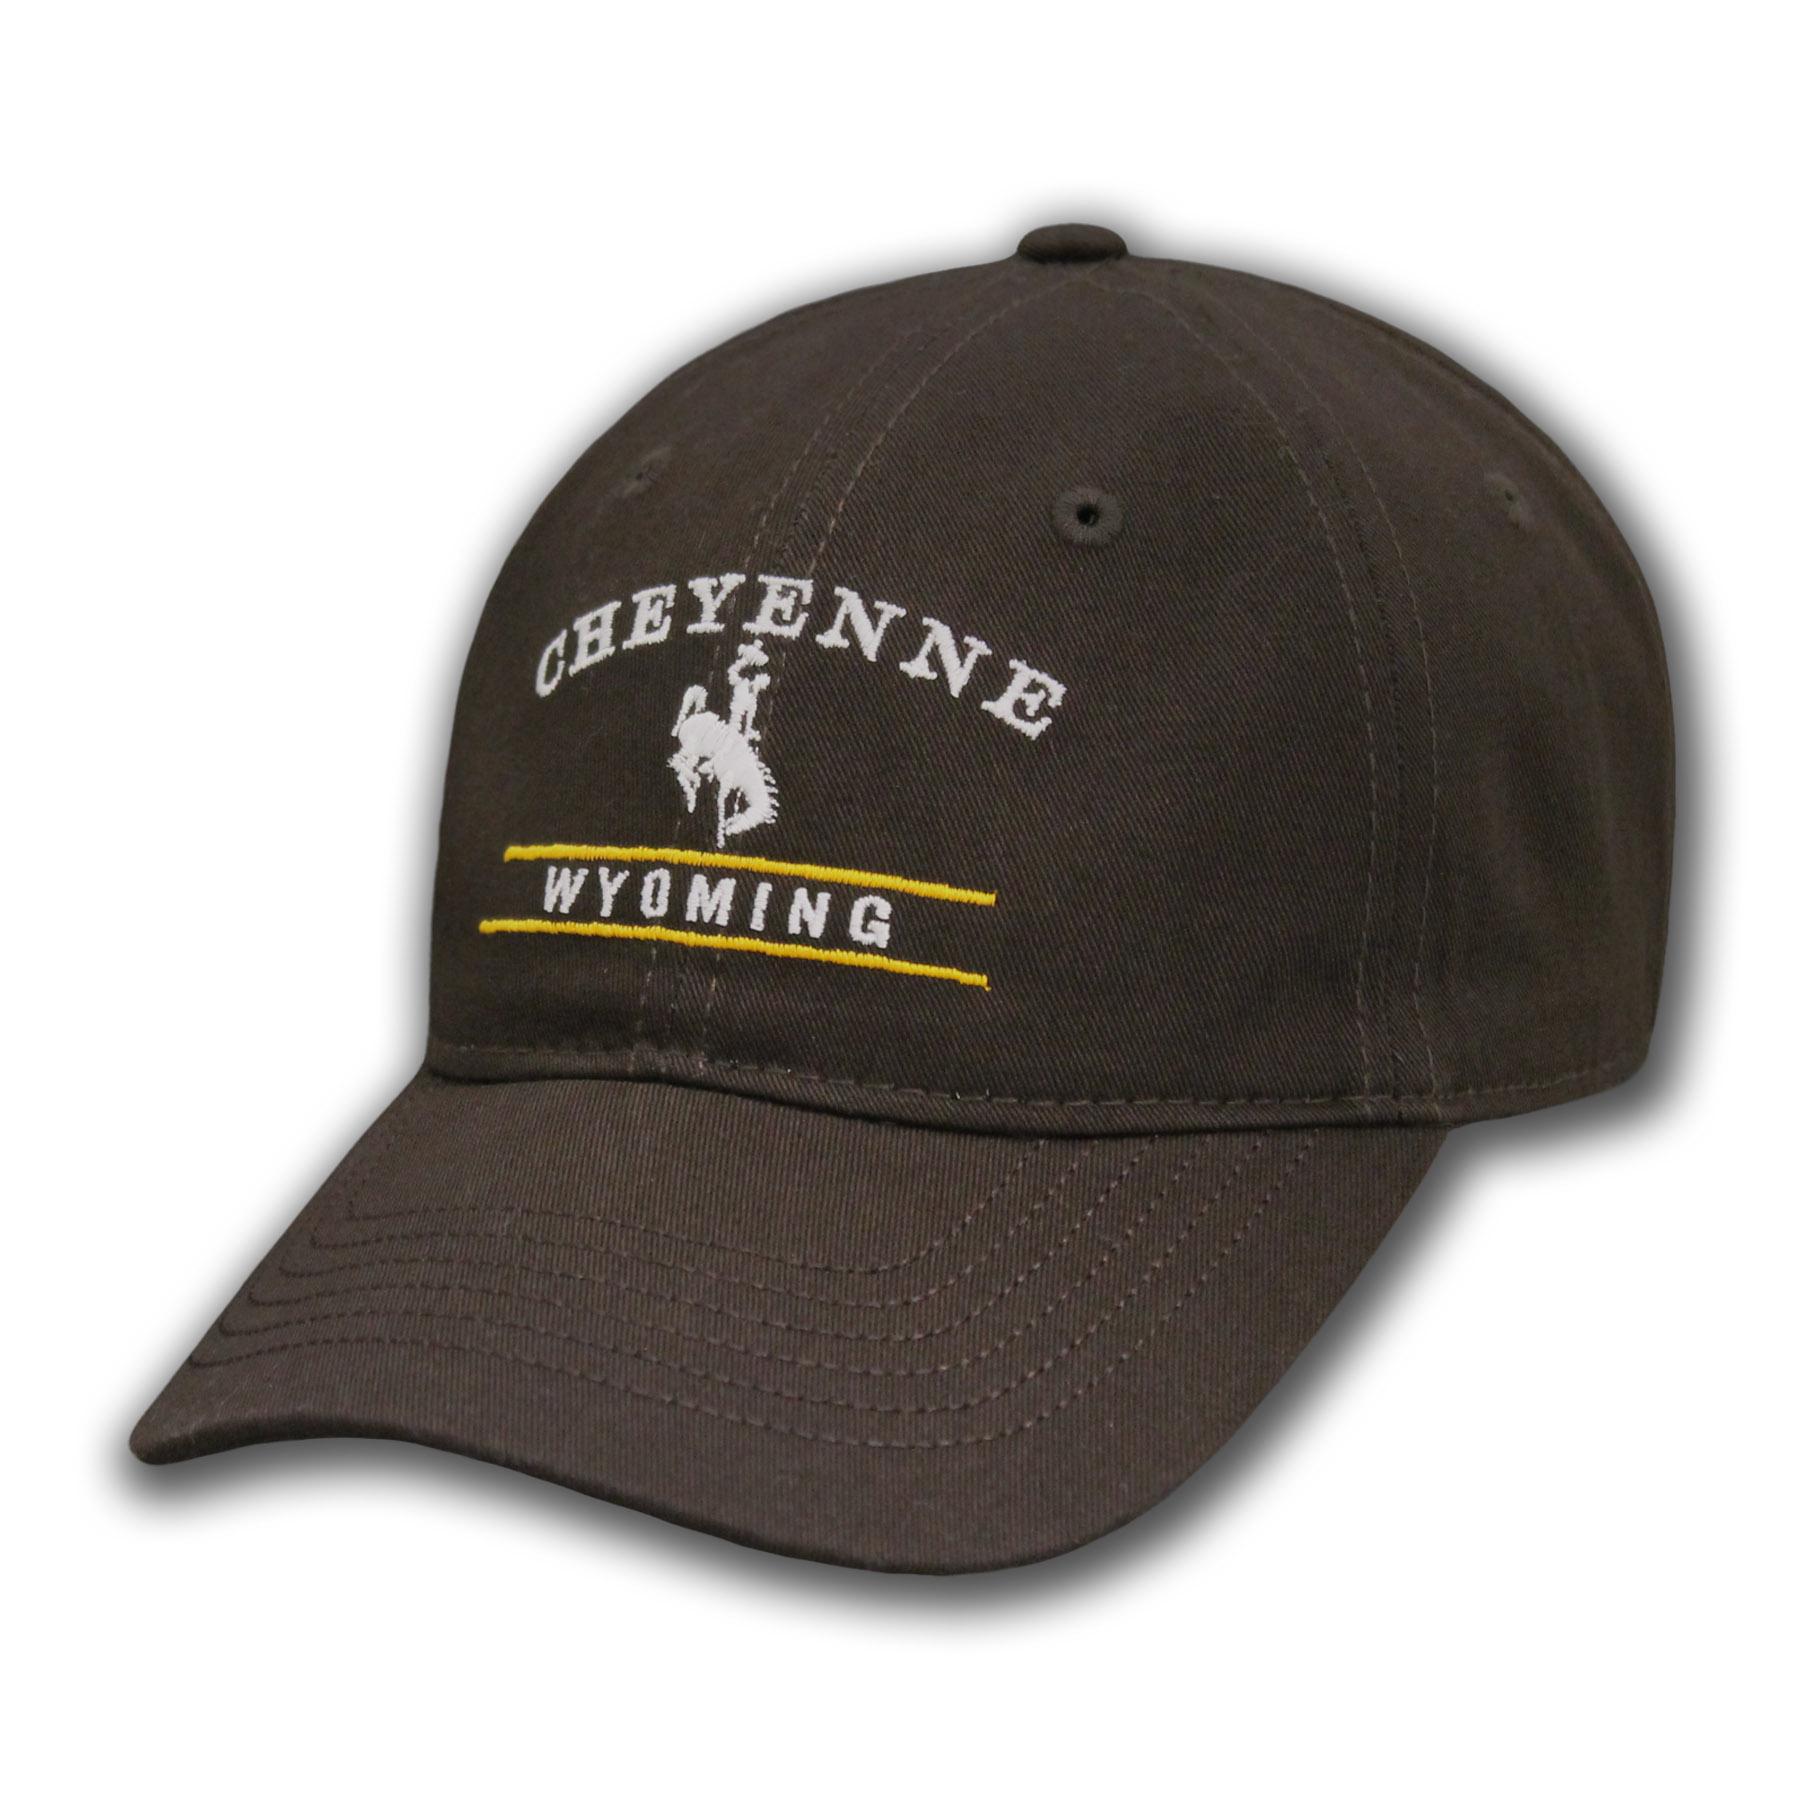 Cheyenne Wyoming Dad Hat